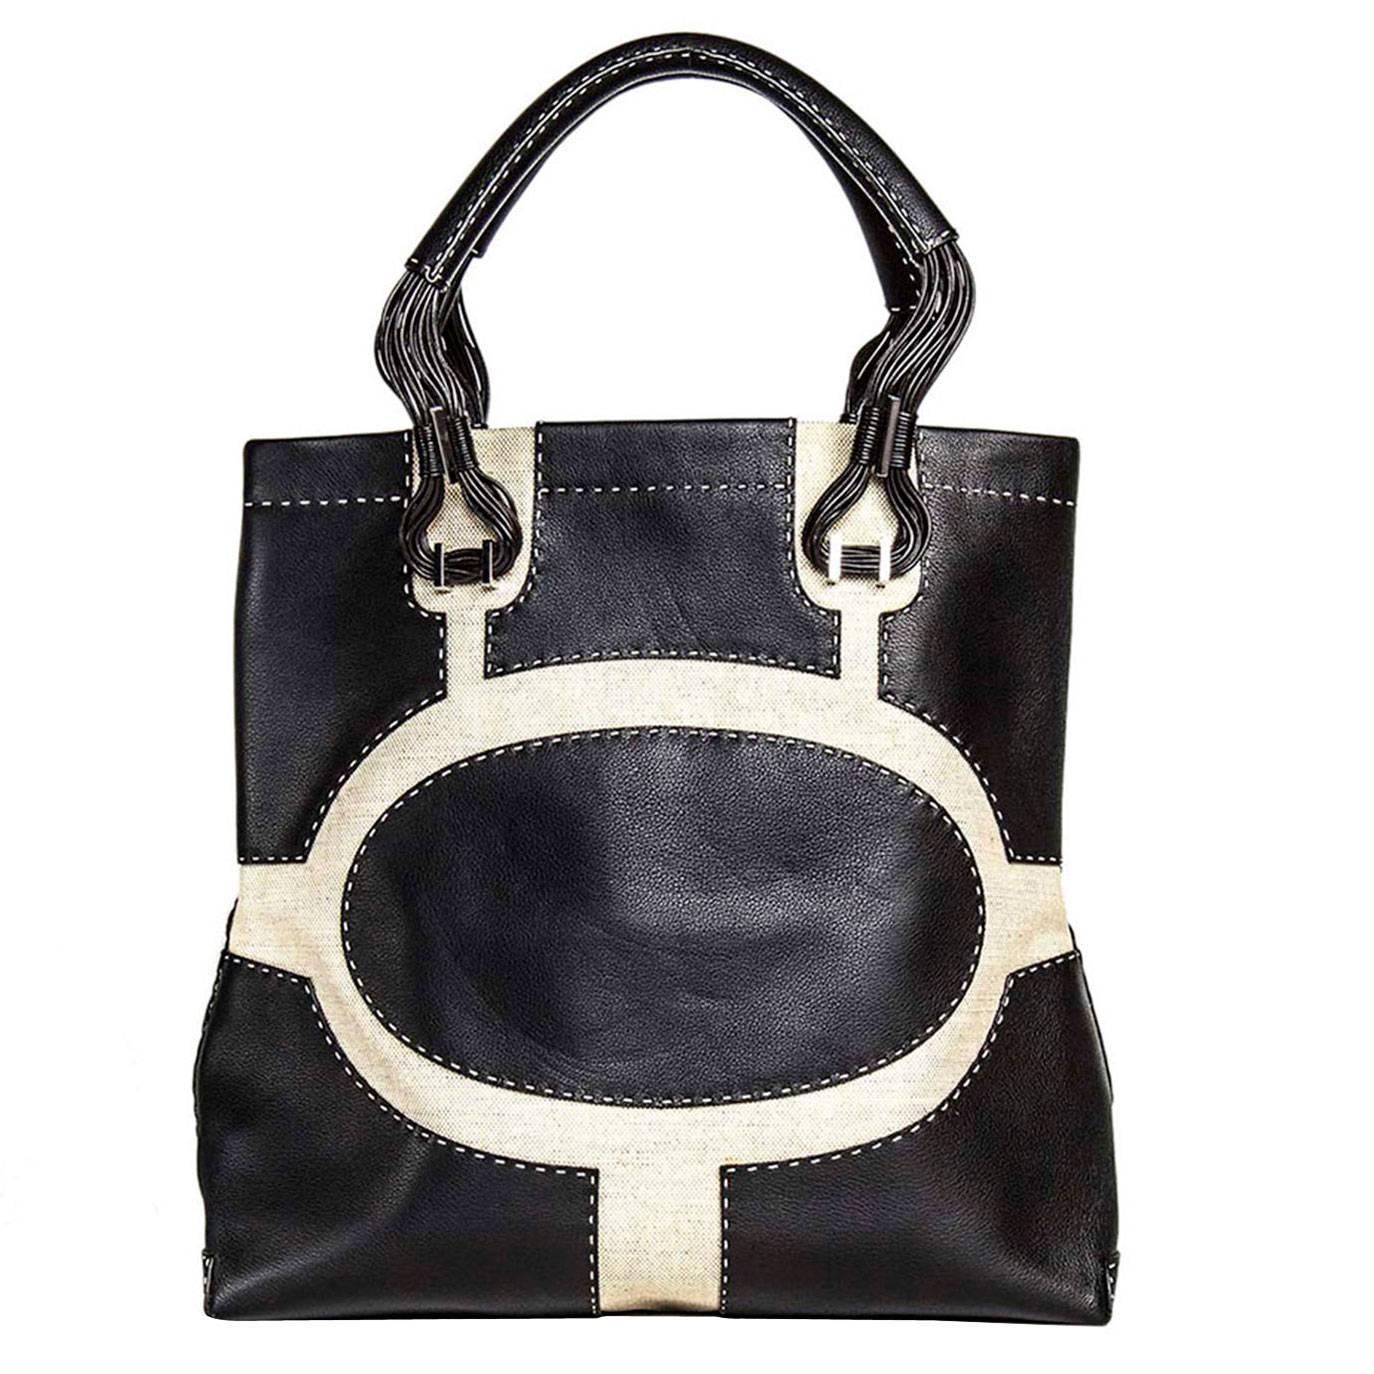 1stdibs Vbh Black Leather & Canvas Bag PDgi2wRas2